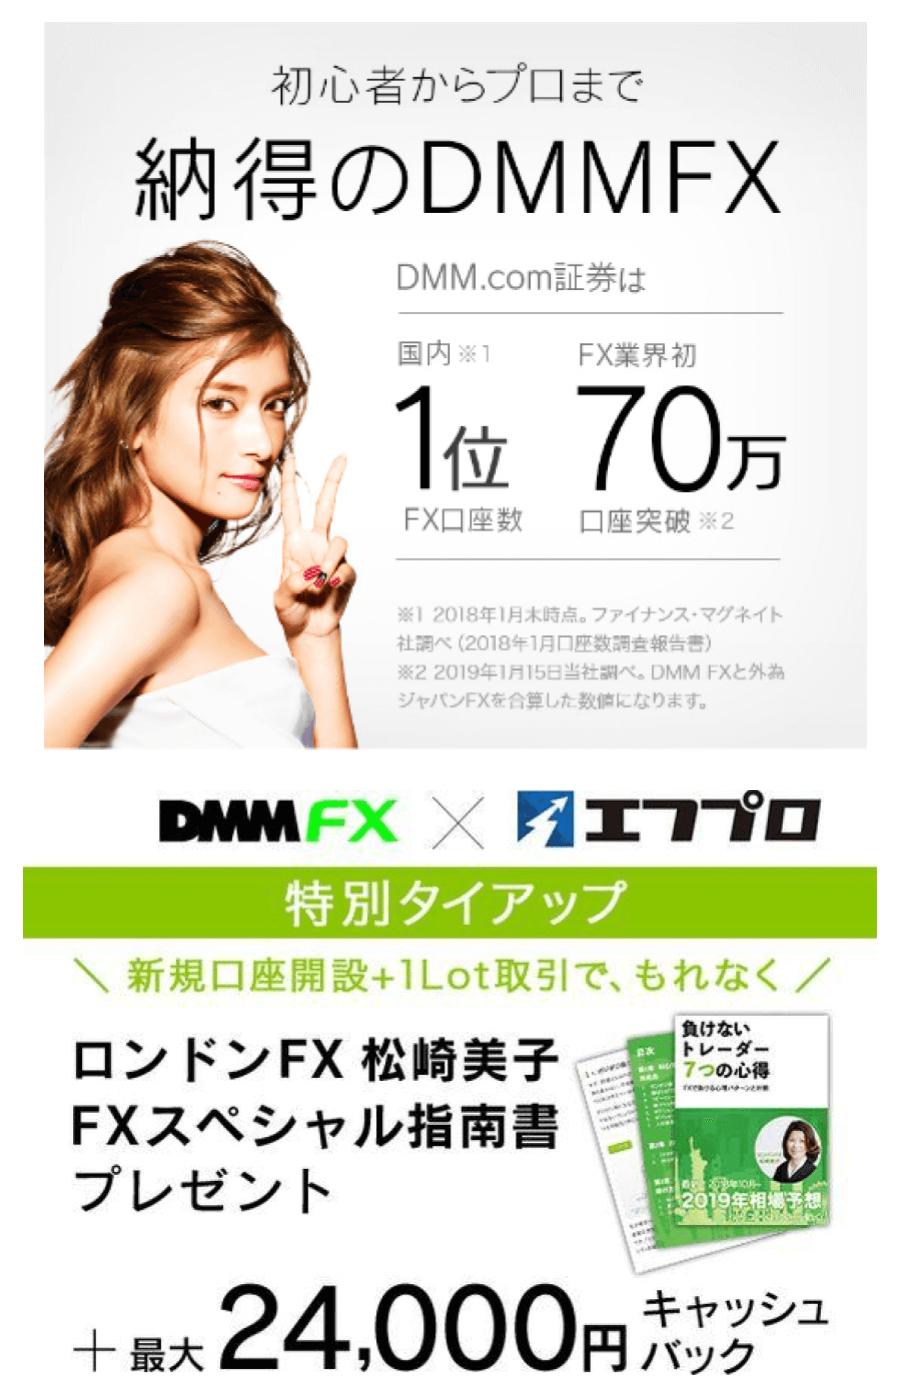 DMMFX公式LPキャプチャ